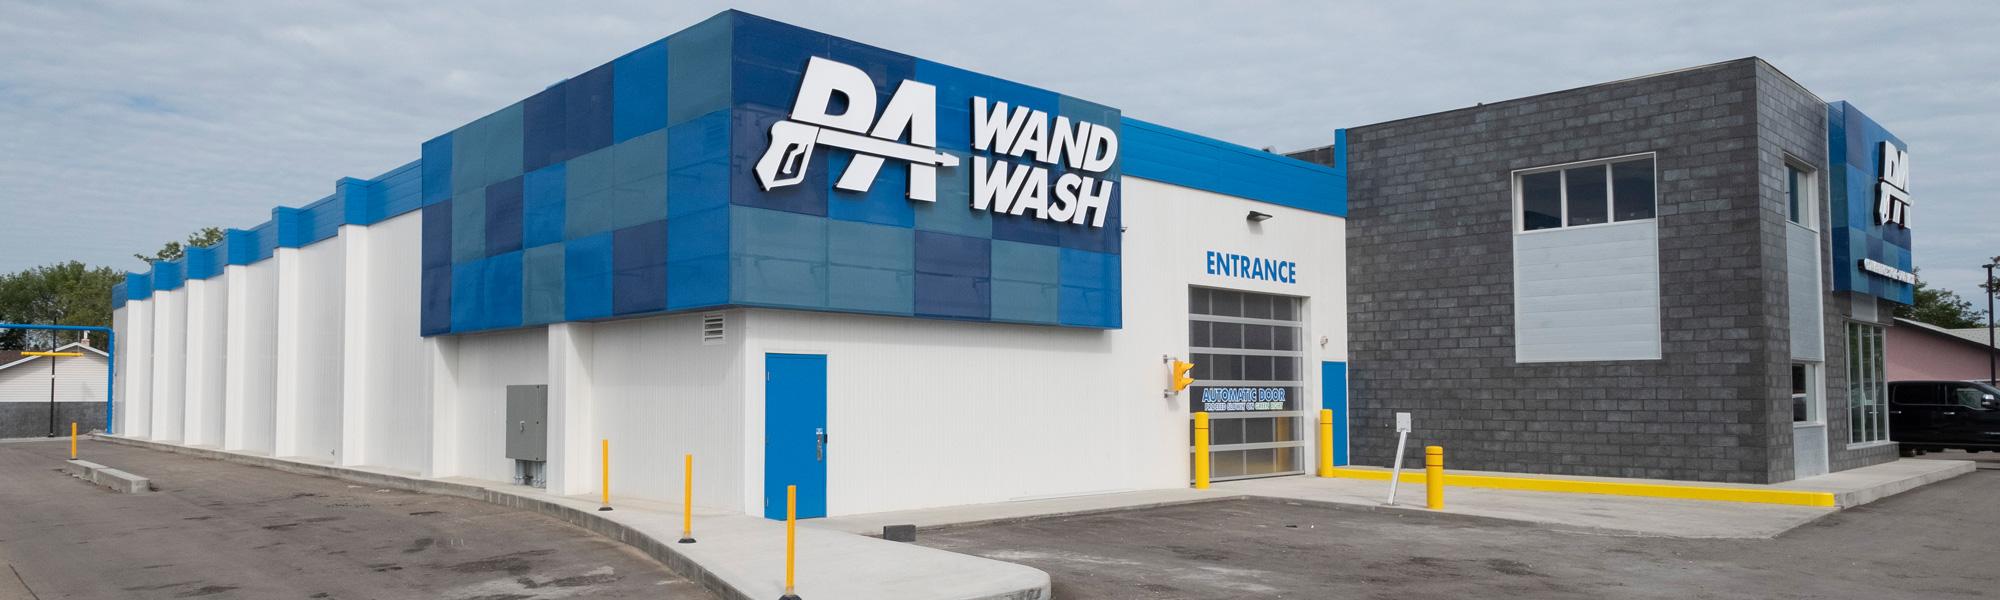 PA Wand Wash